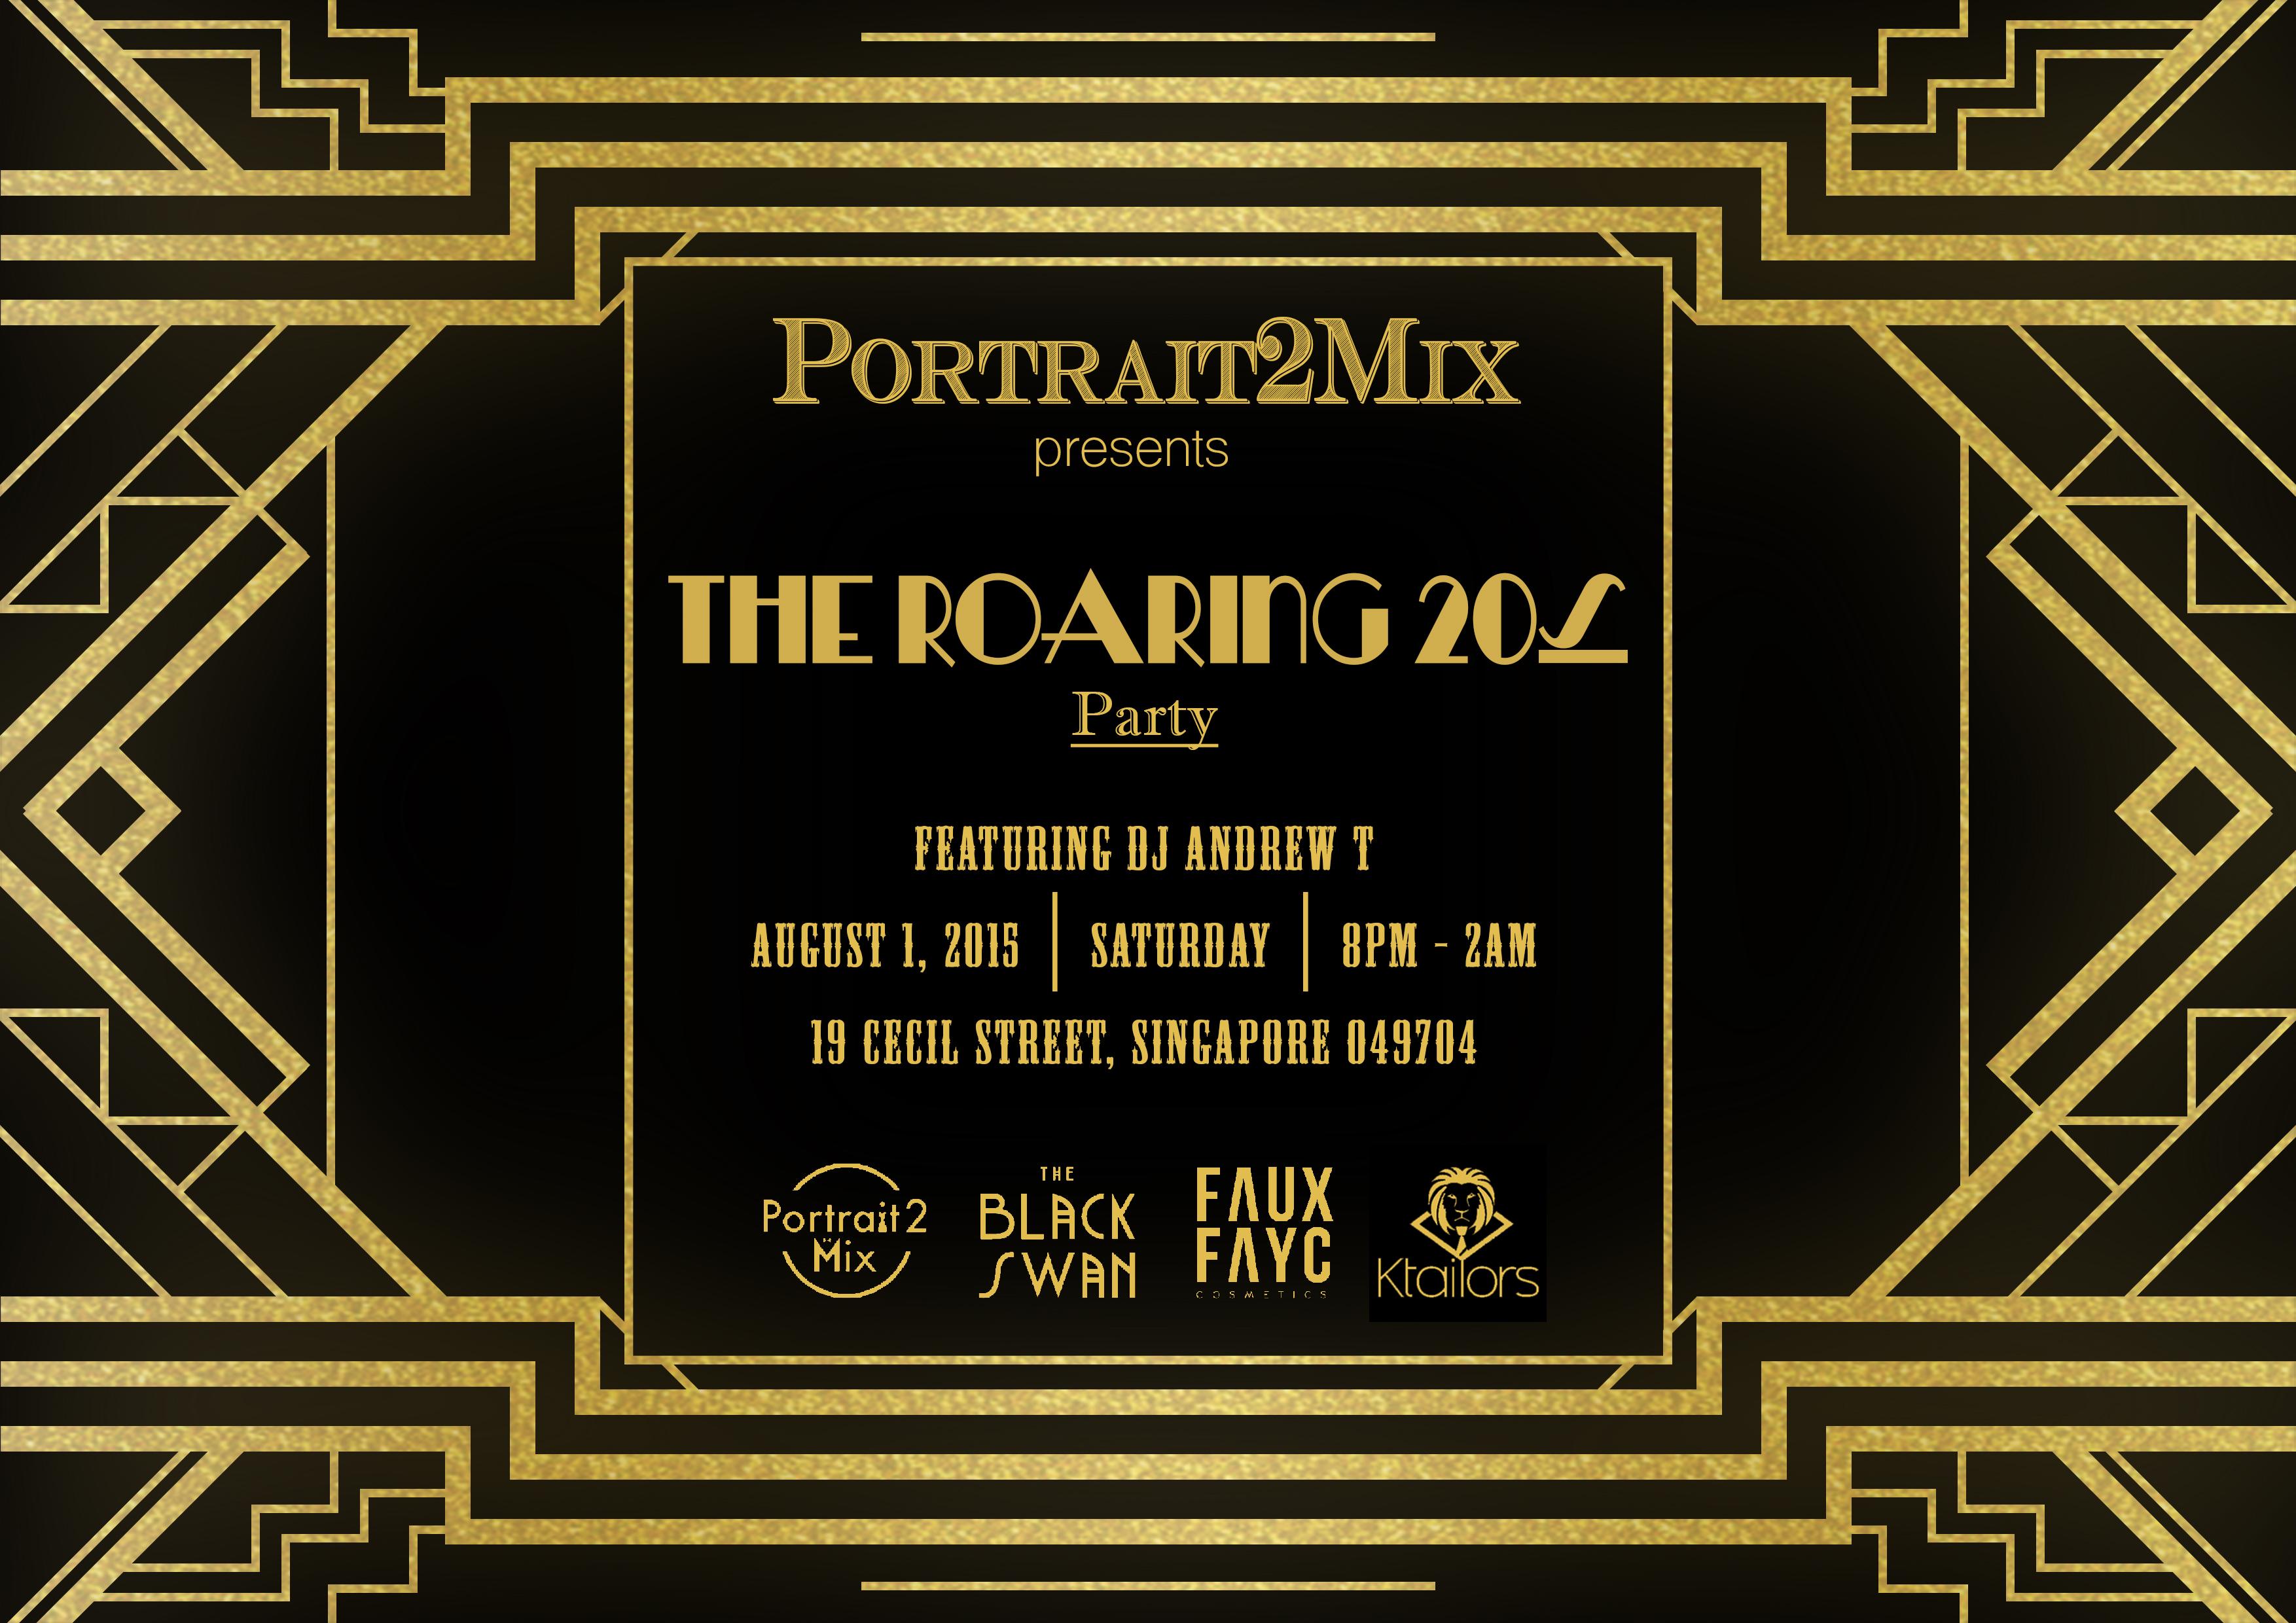 The Roaring 20s Party Registration, Singapore - EventNook